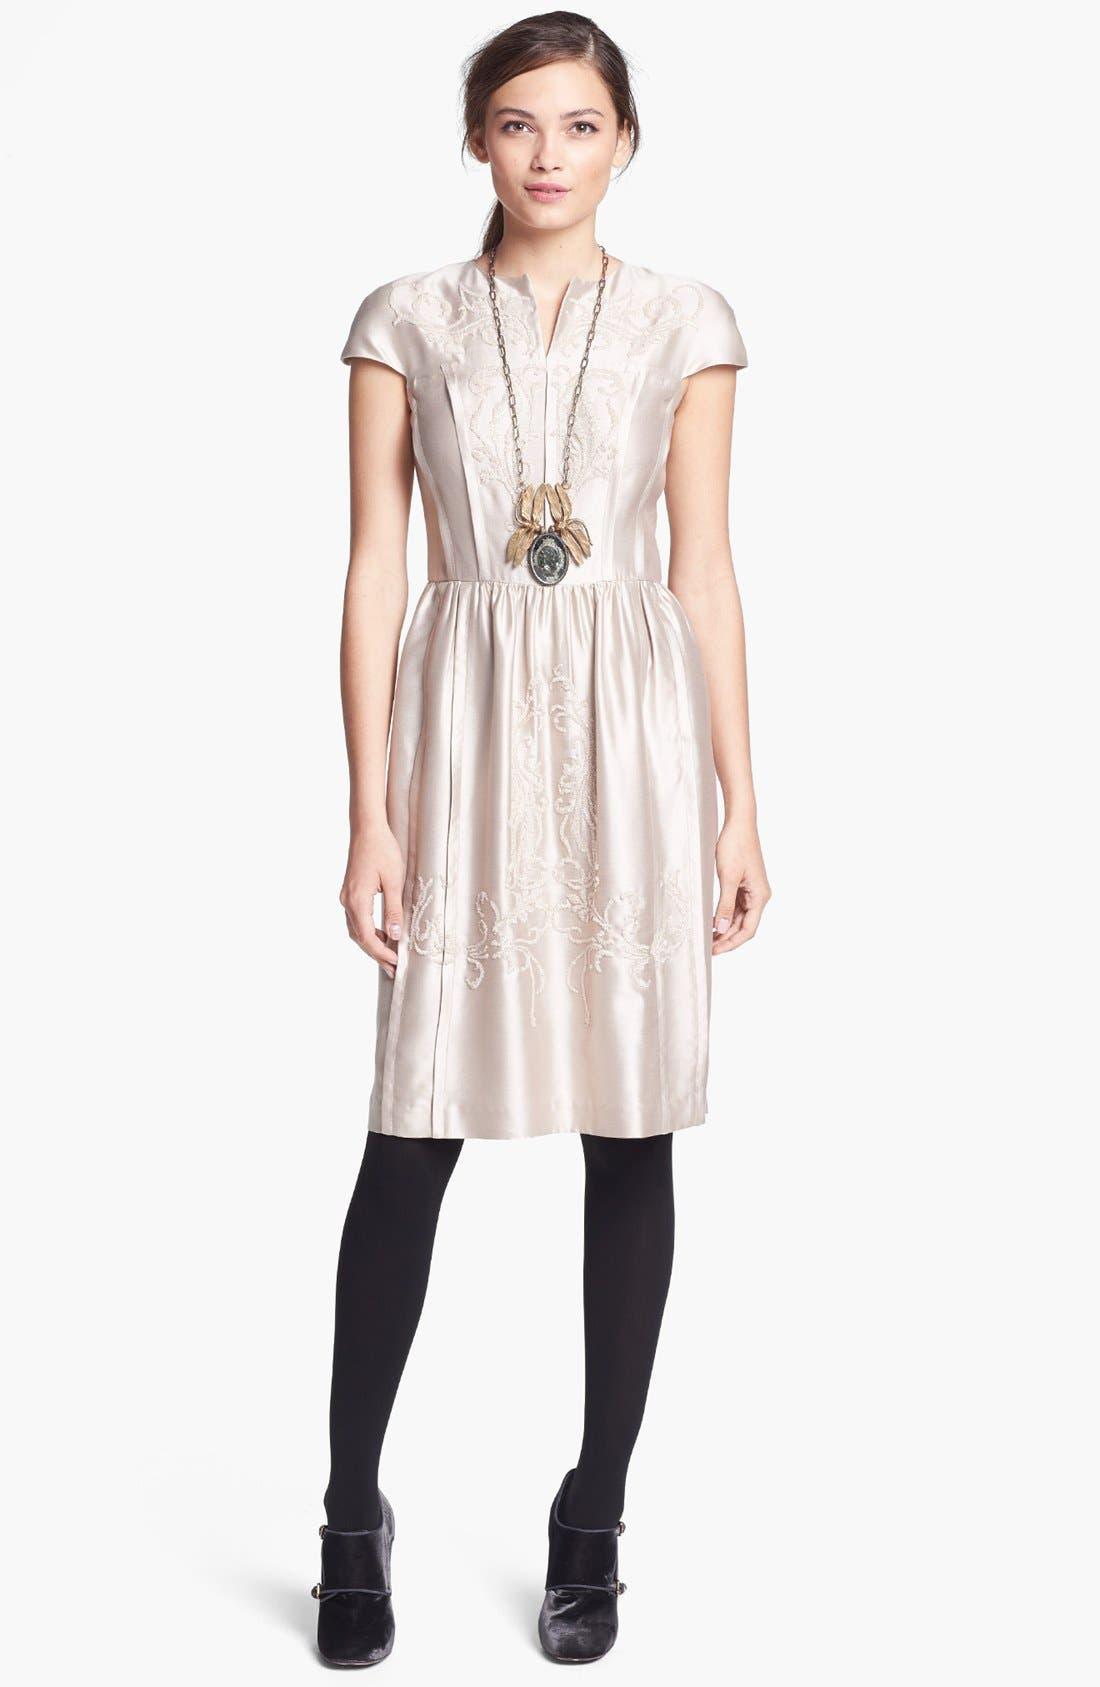 Alternate Image 1 Selected - Tory Burch 'Jessie' Silk Dress